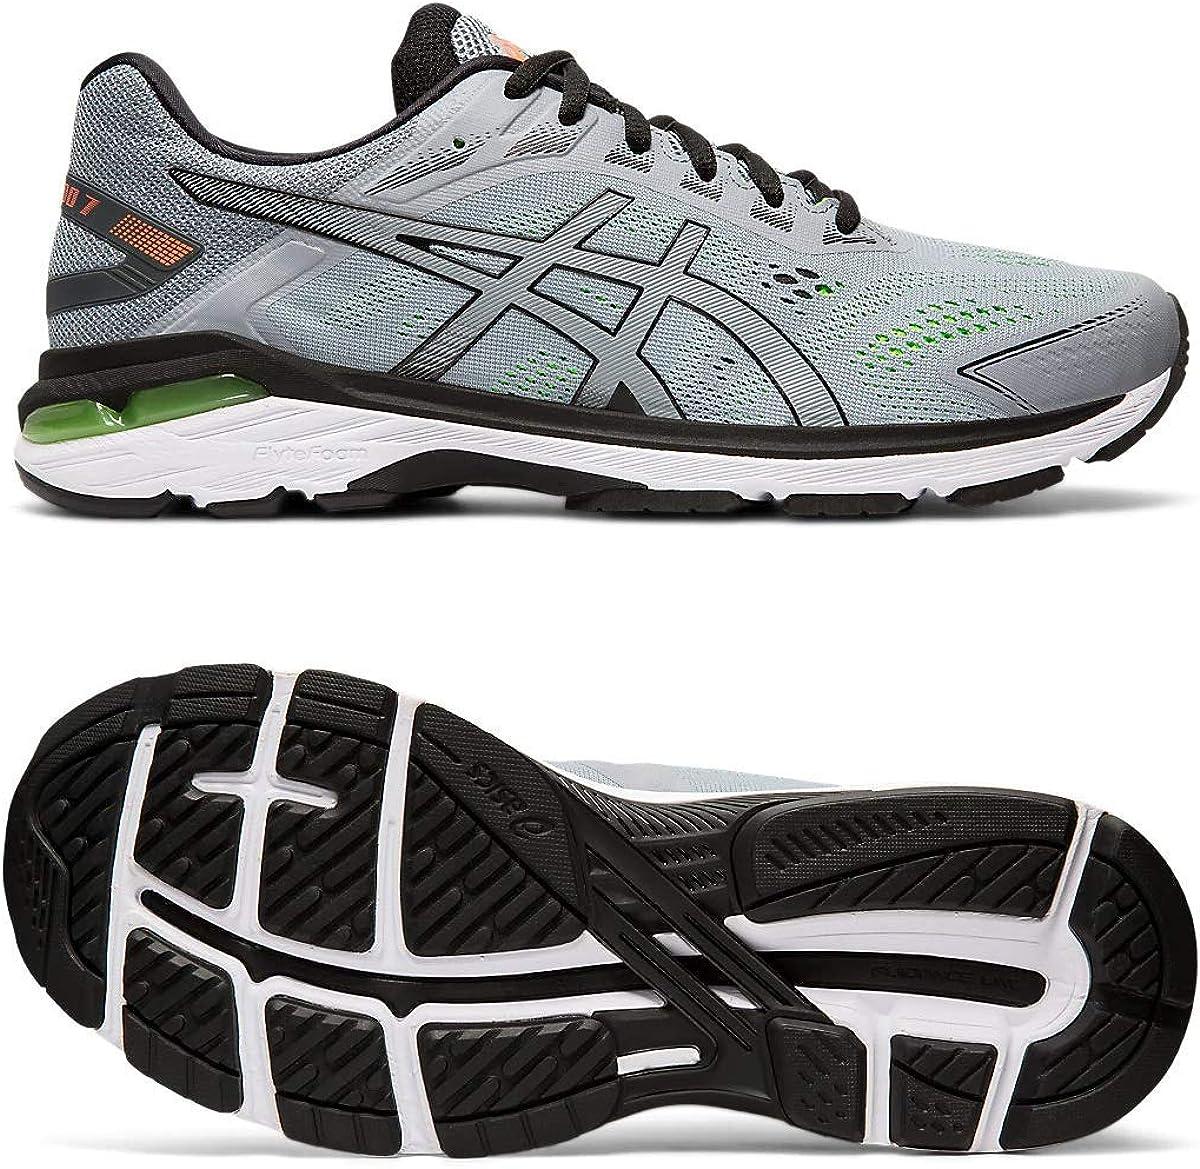 ASICS GT-2000 7 AW19 - Zapatillas de Running, Sheet Rock/Sheet Rock, 48.5: Amazon.es: Deportes y aire libre